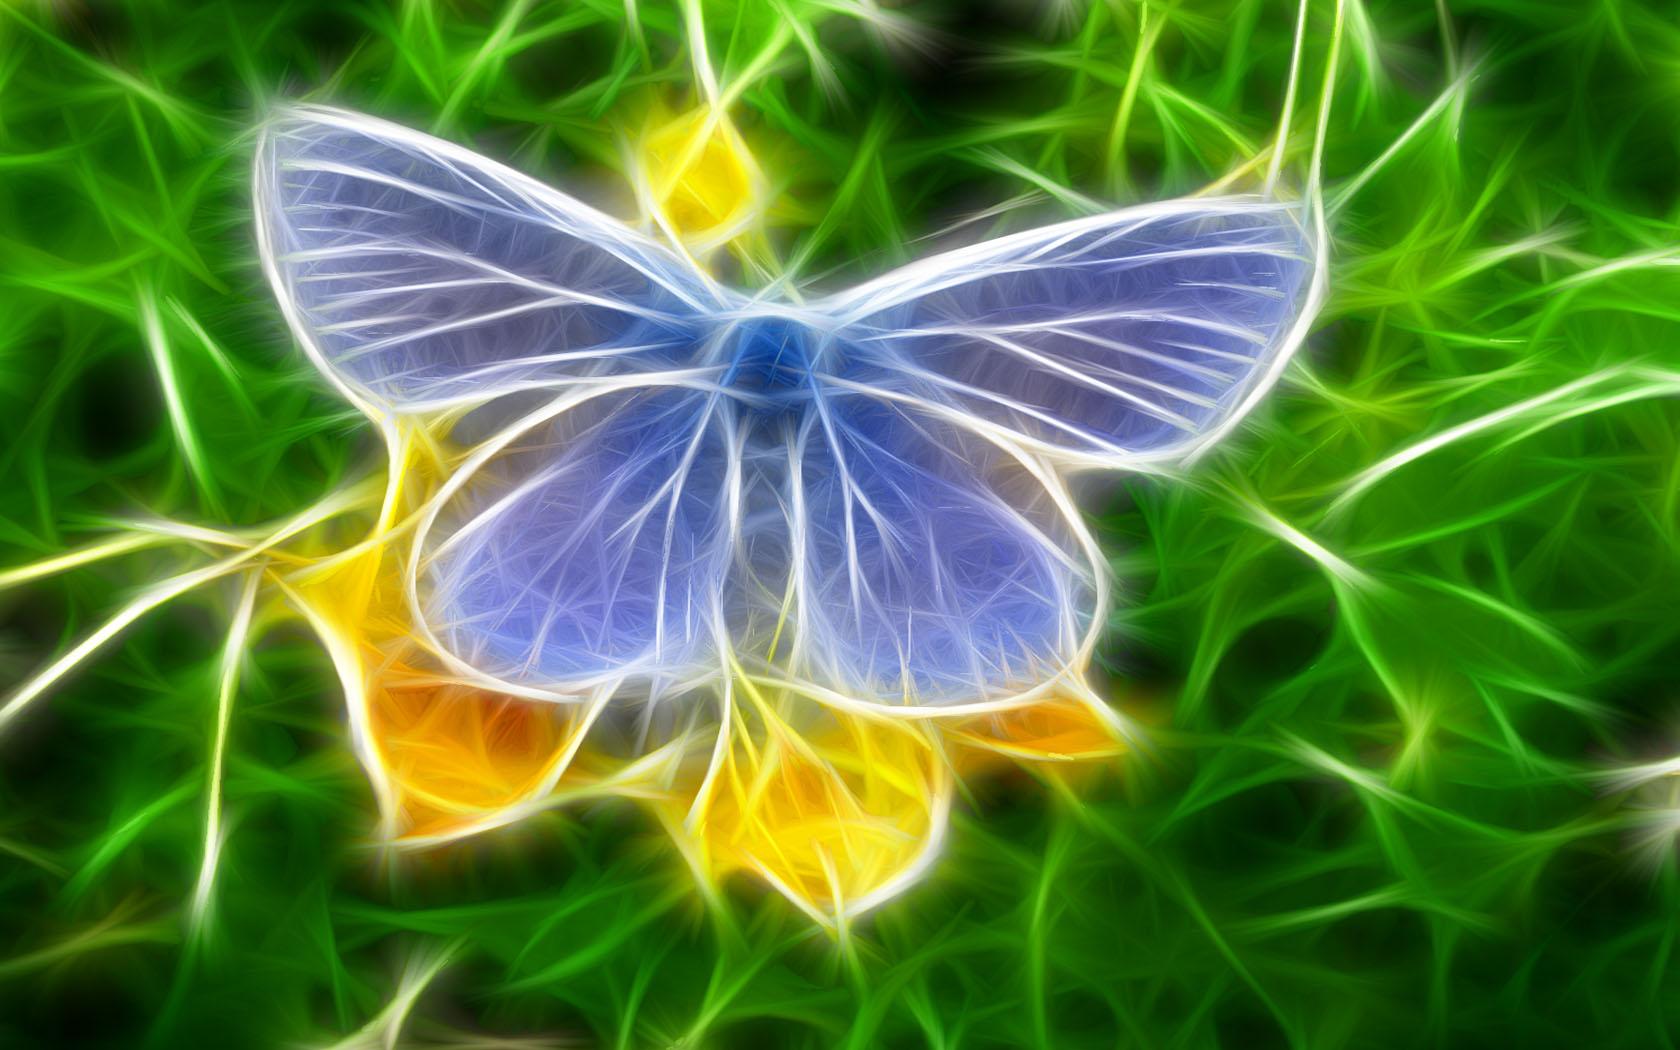 Fond d'ecran Papillon bleu Dessin - Wallpaper